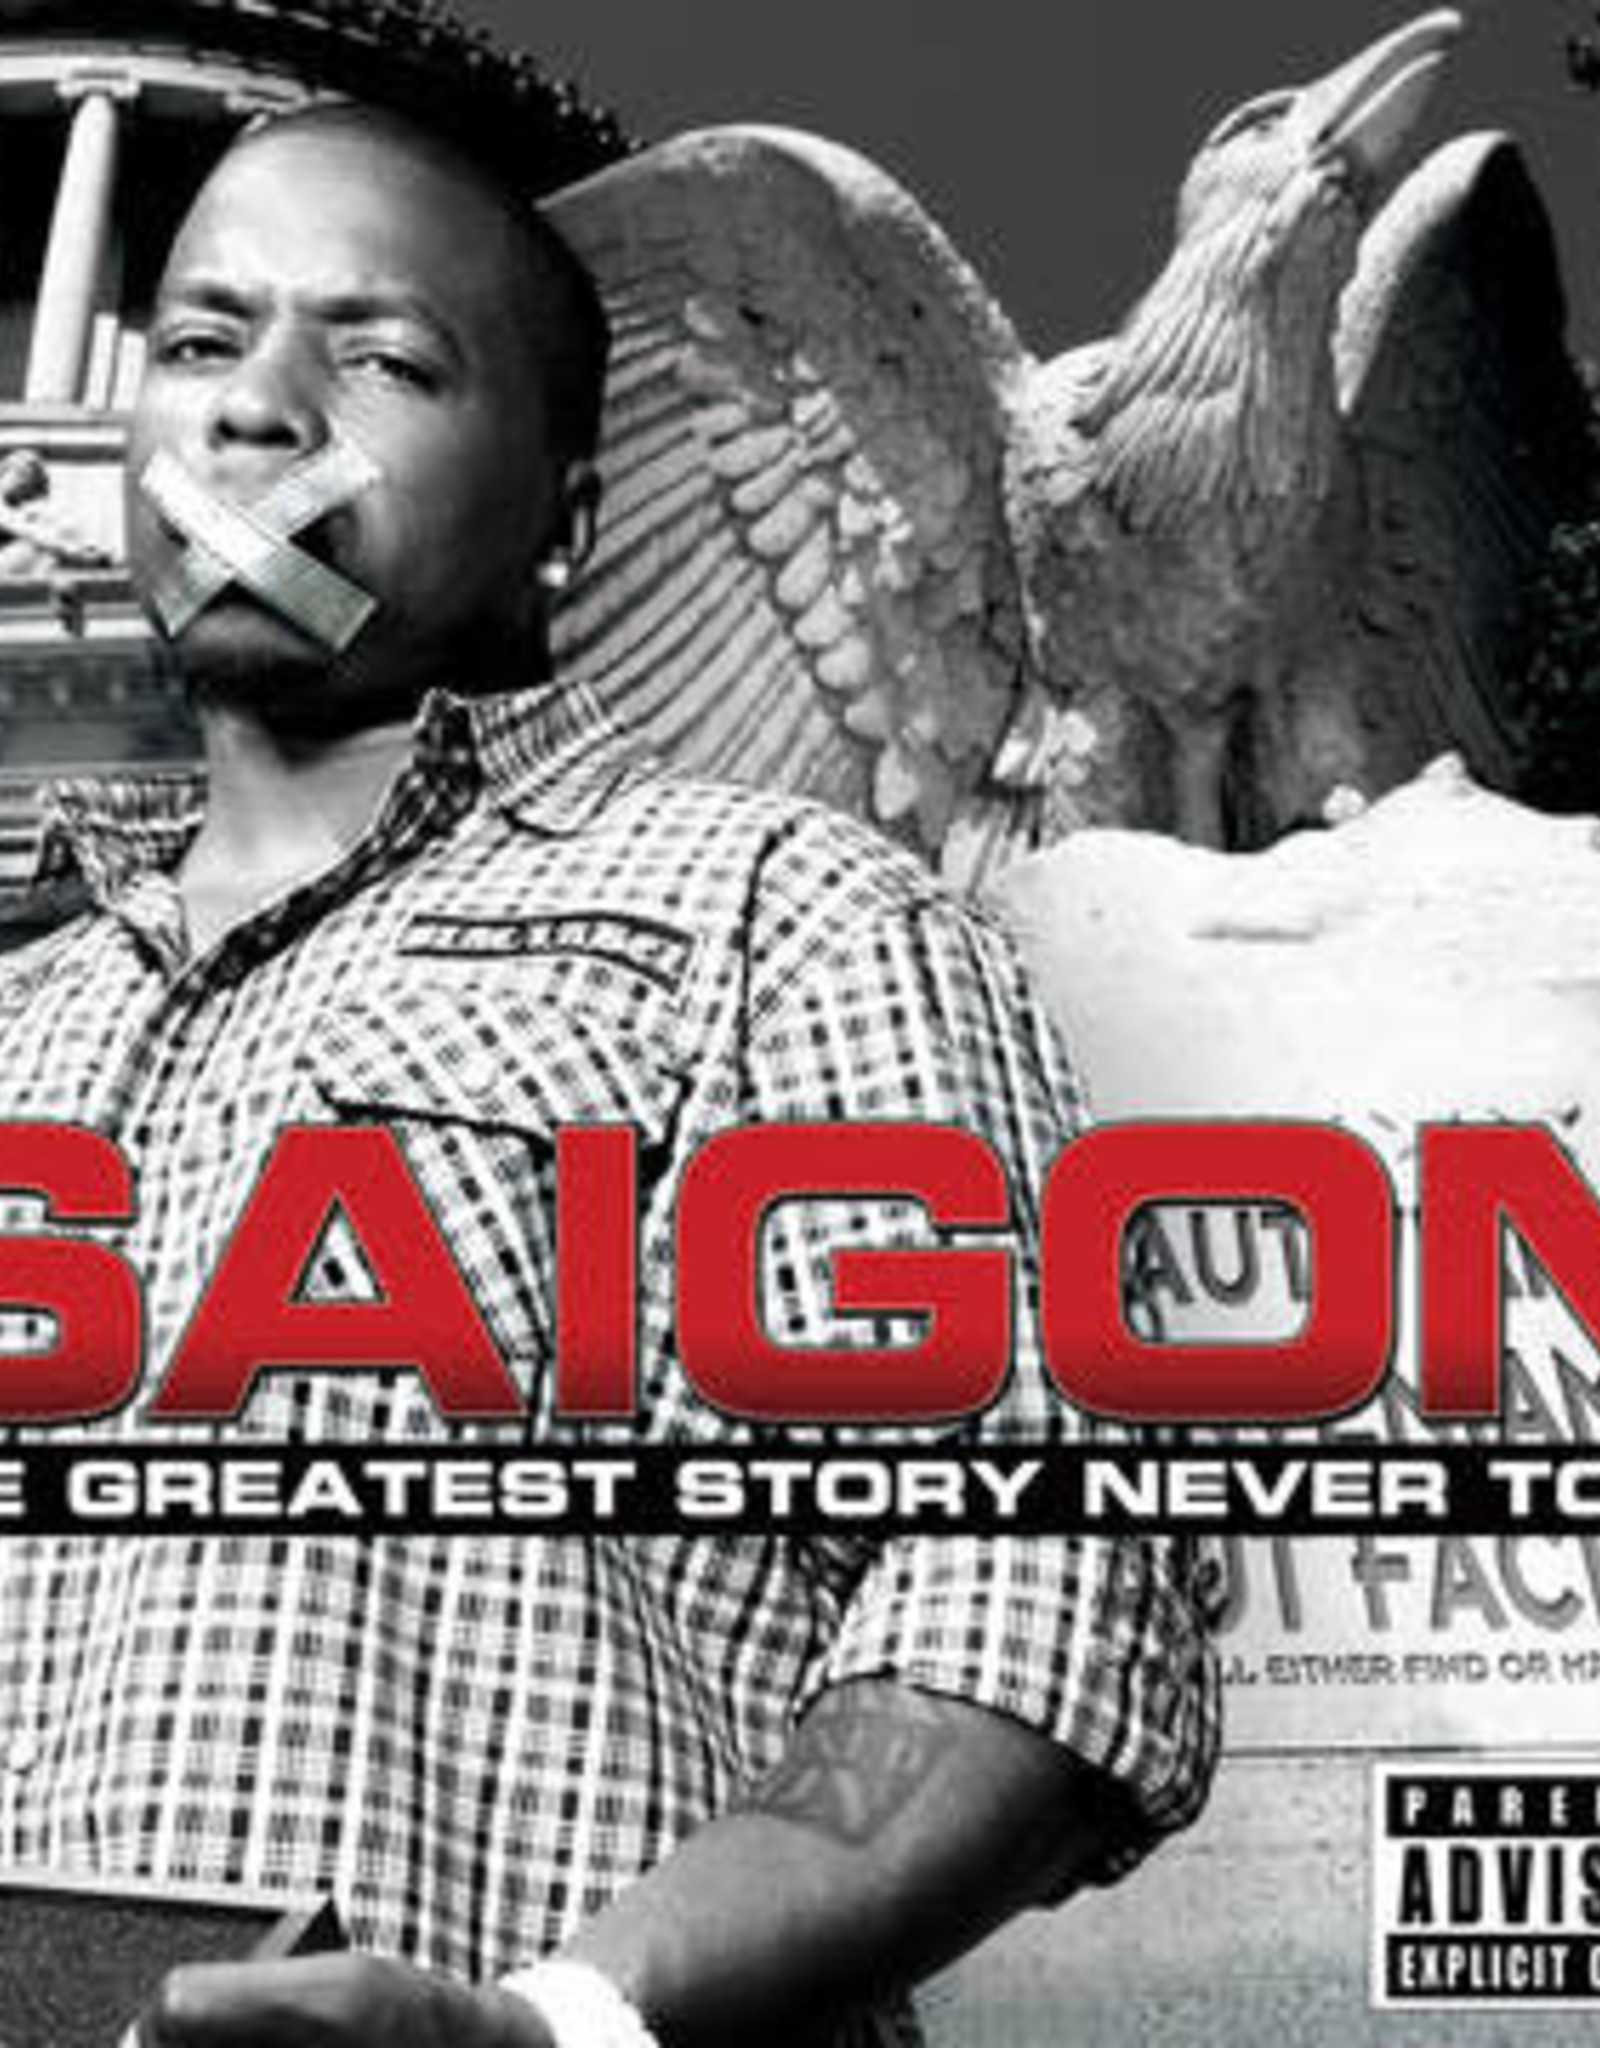 Saigon - Greatest Story Never Told (RSD 7/21)